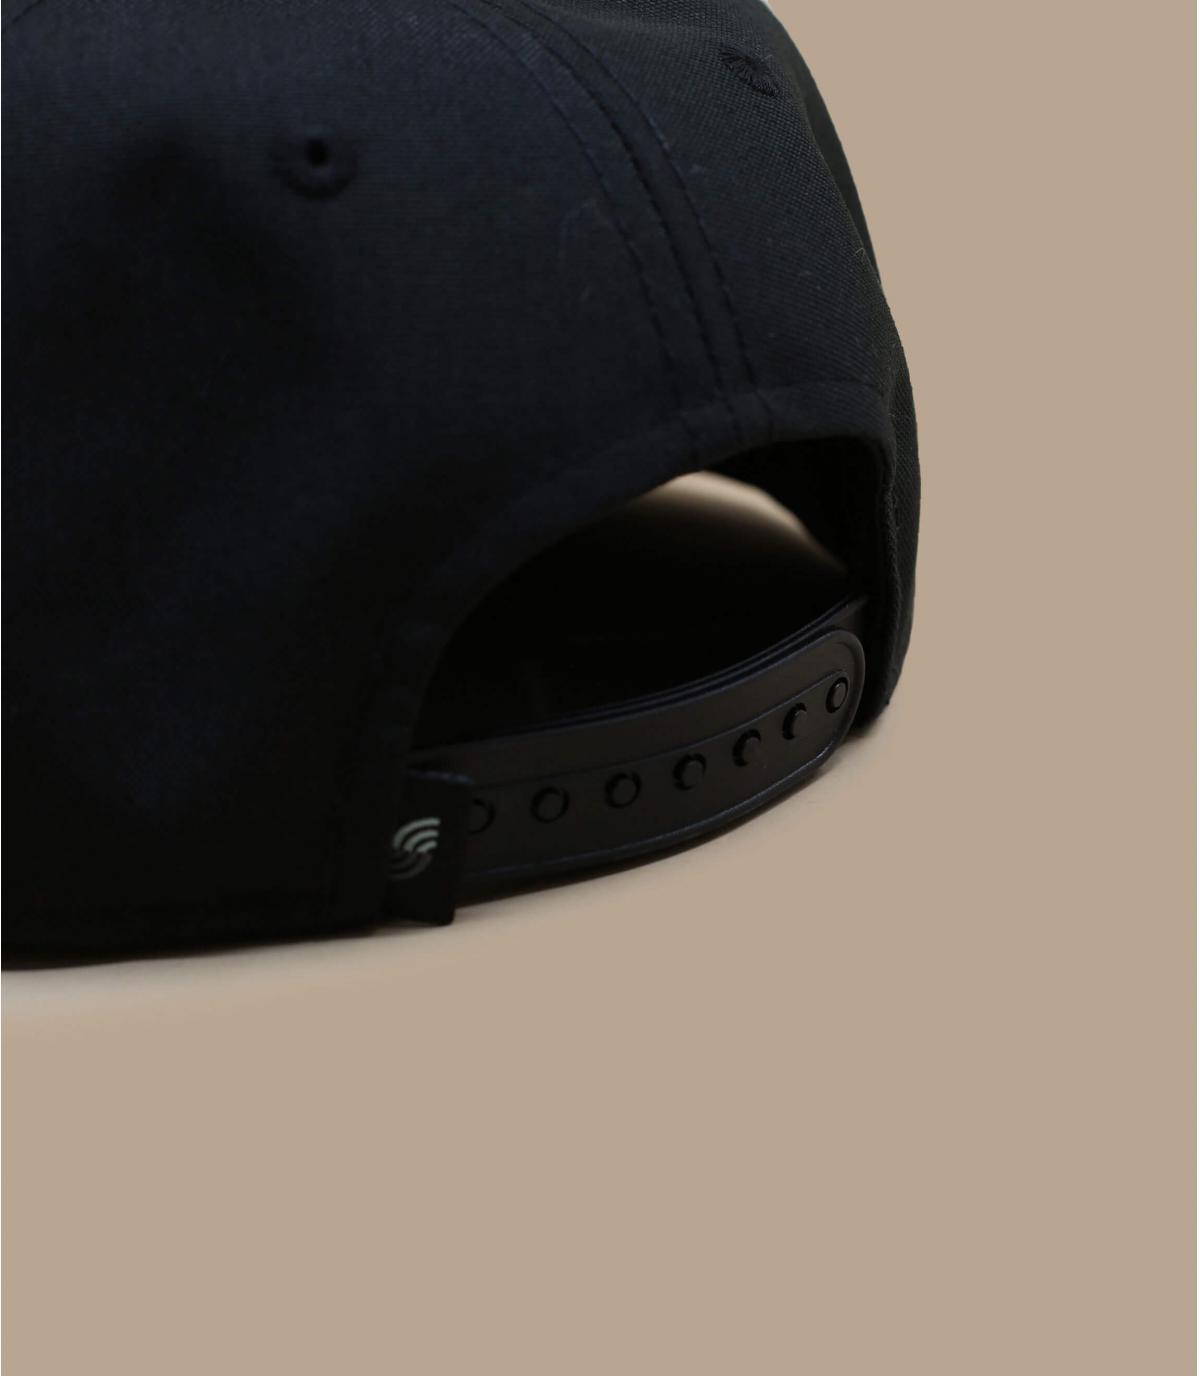 Details Snapback Recycled black - Abbildung 4